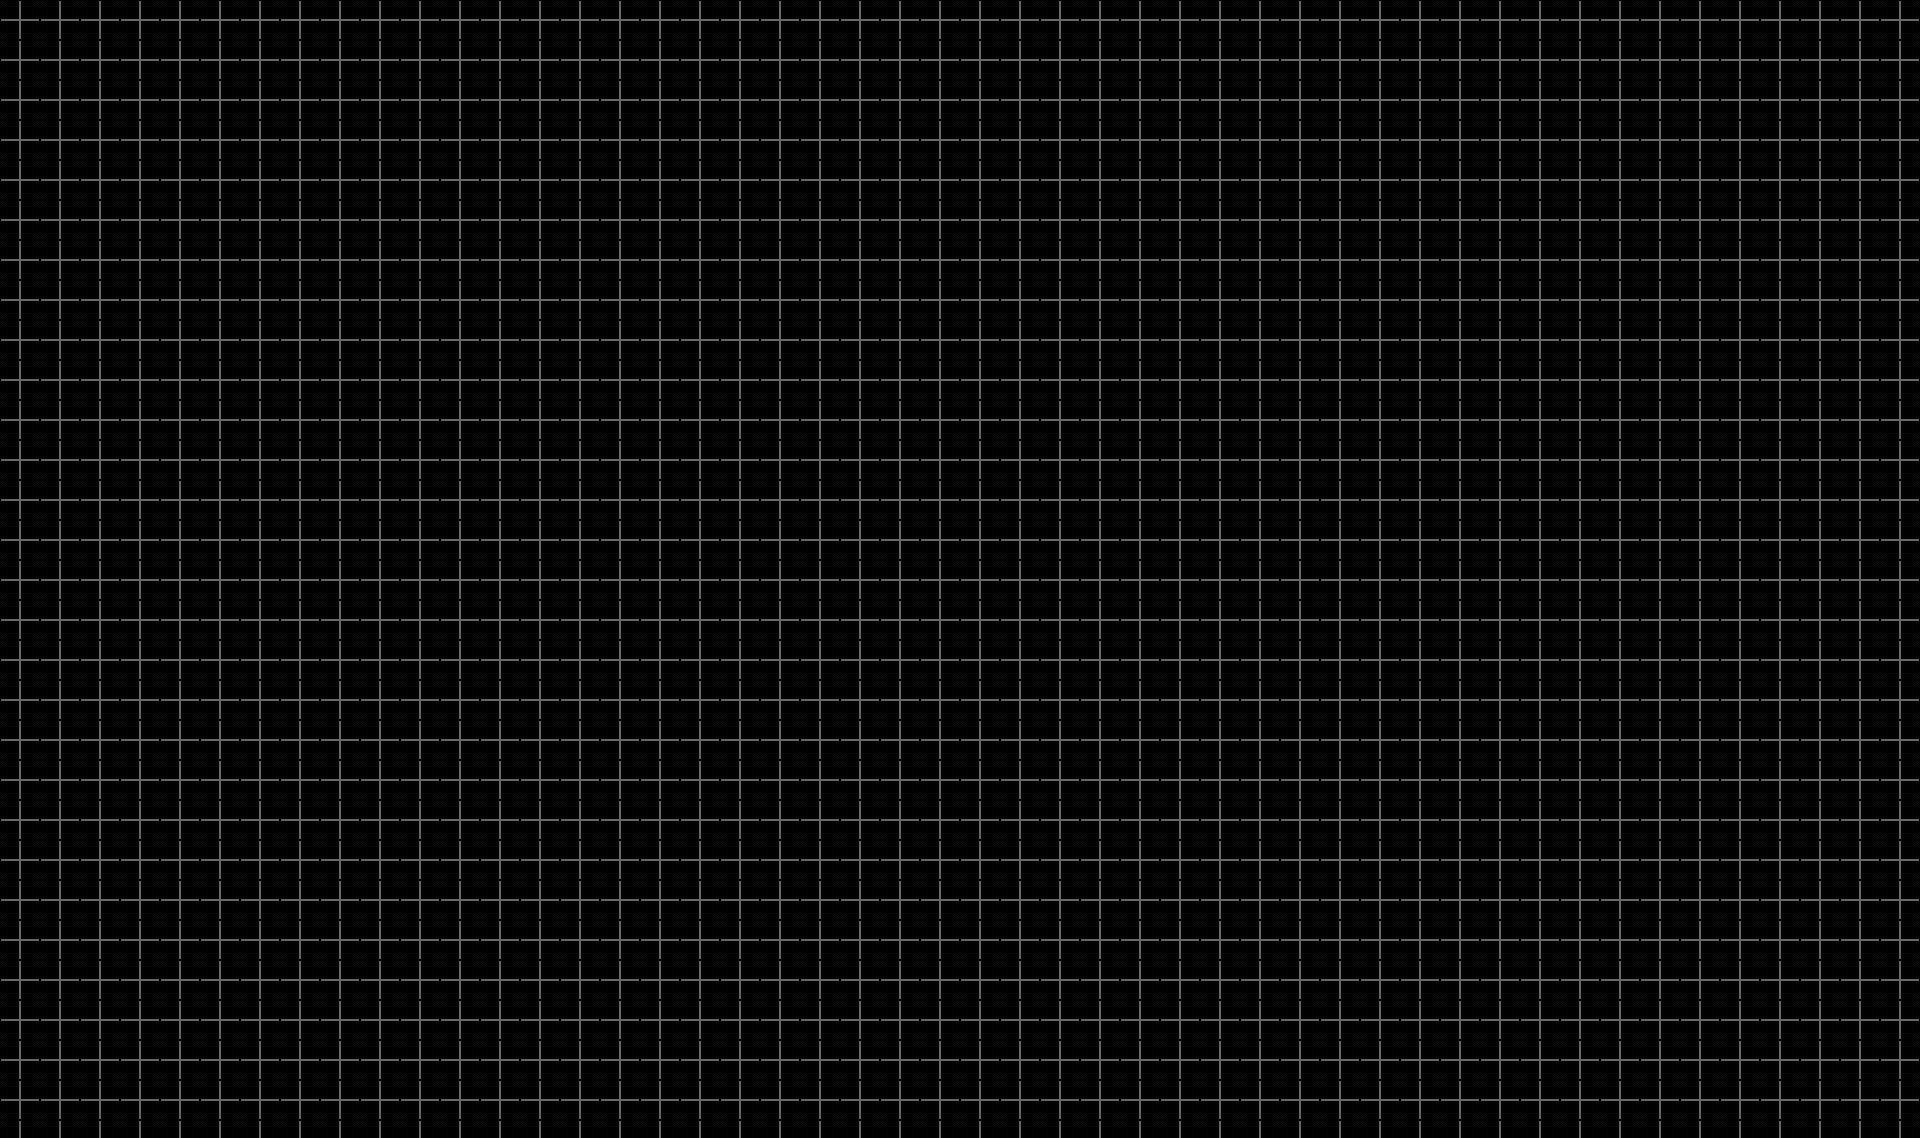 Black Aesthetic Tumblr Laptop Wallpapers Top Free Black